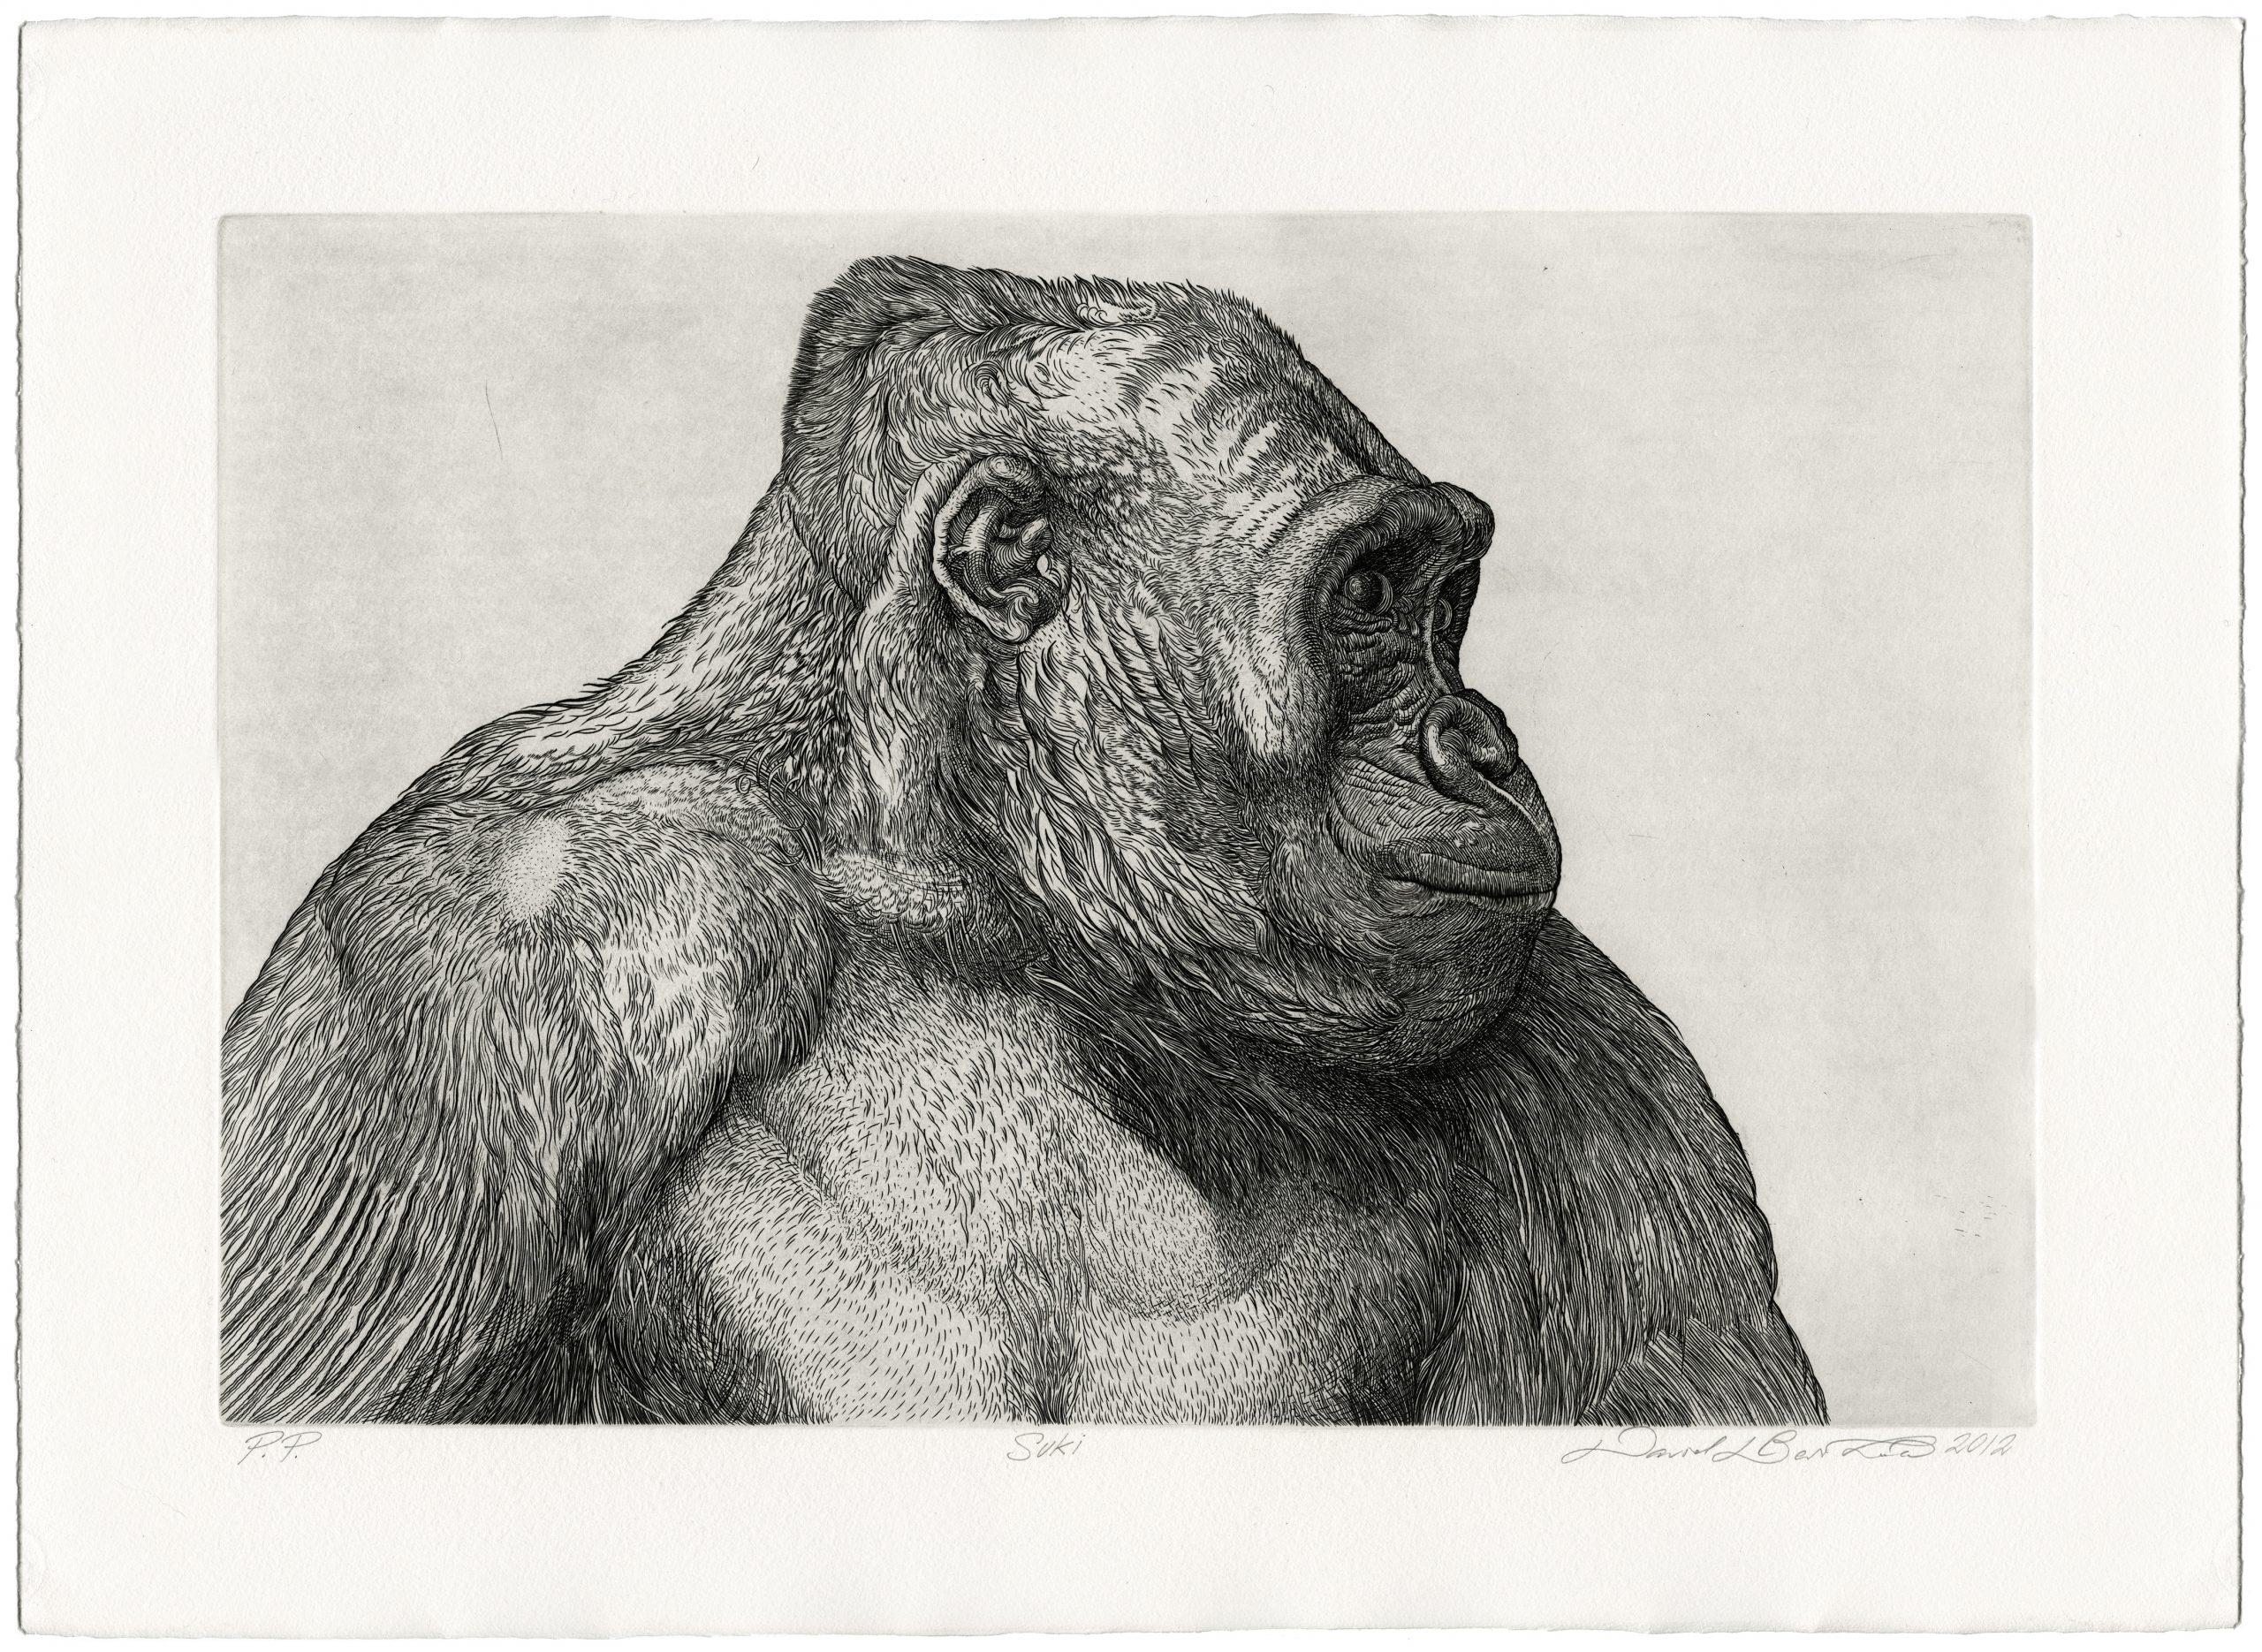 Suki by David Barthold